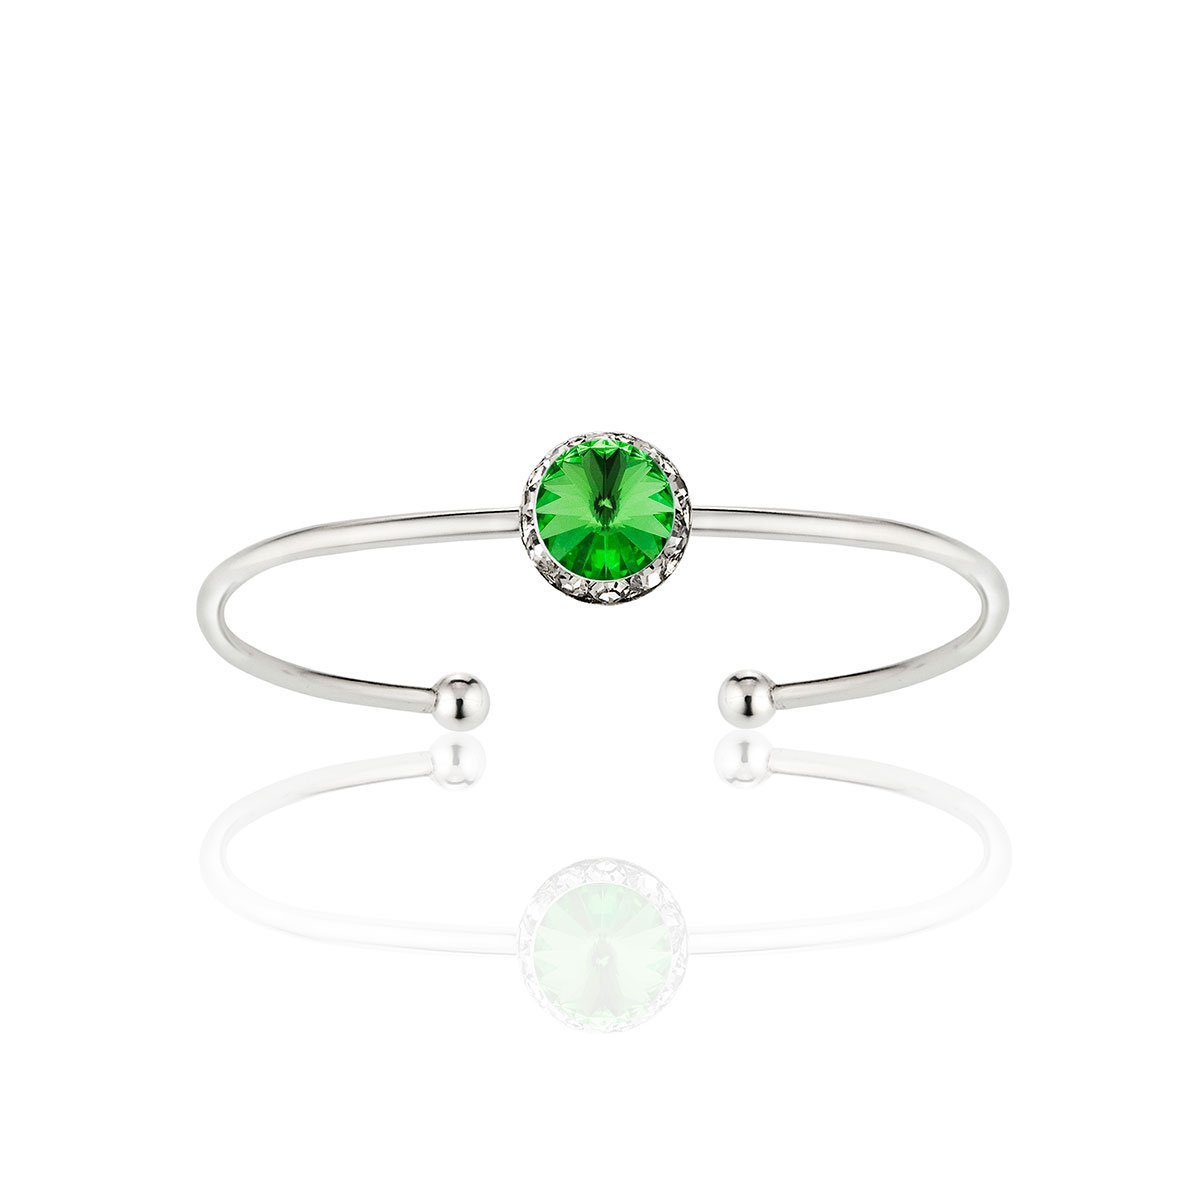 Styles By JS Swarovski Crystal Stackable Birthstone Cuff Bracelet (08 - Peridot Olive Green - August)